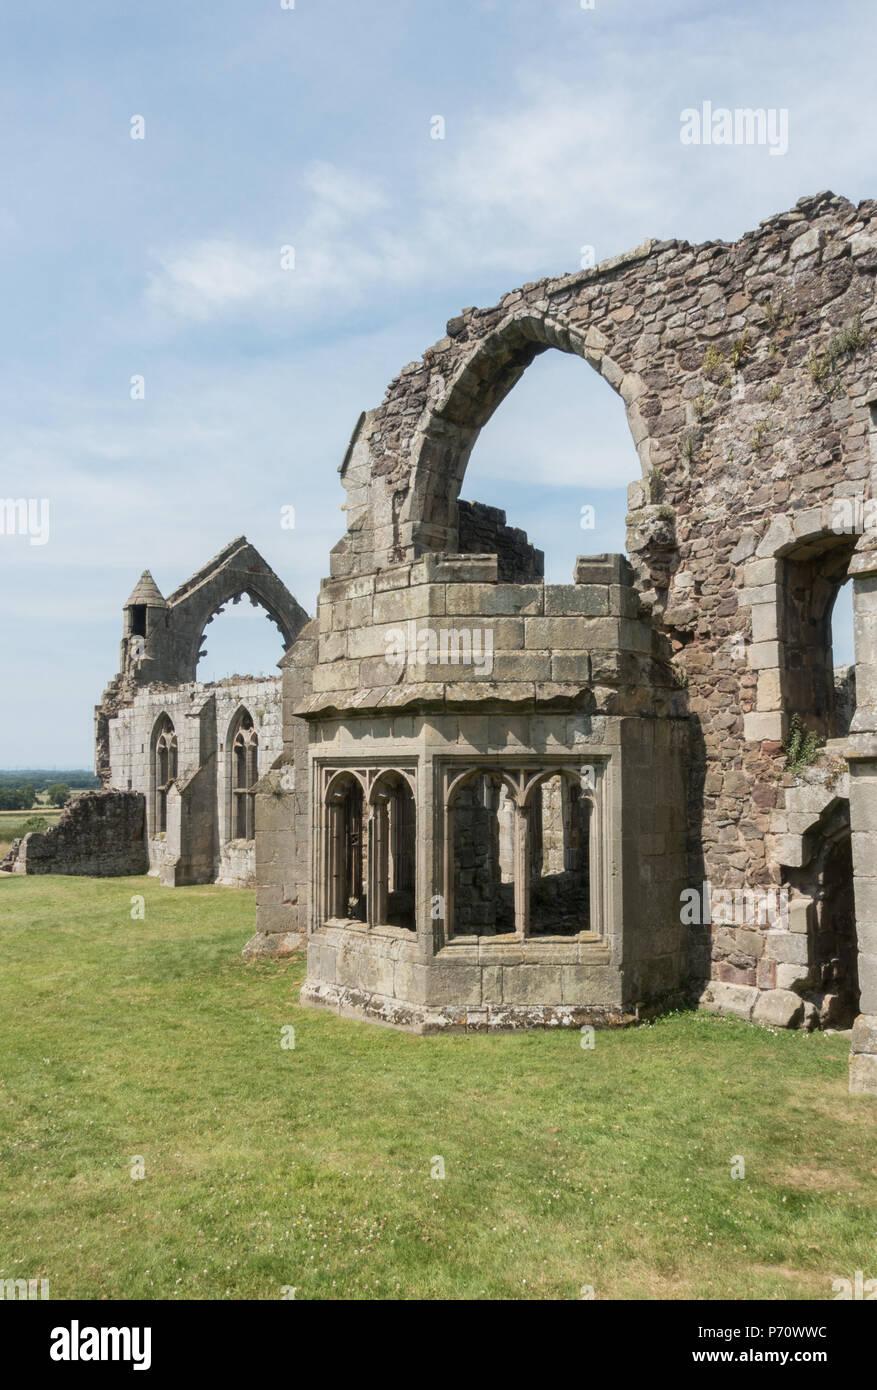 English Heritage site Haughmond Abbey ruins on the outskirts of Shrewsbury, Shropshire, July 2018 - Stock Image